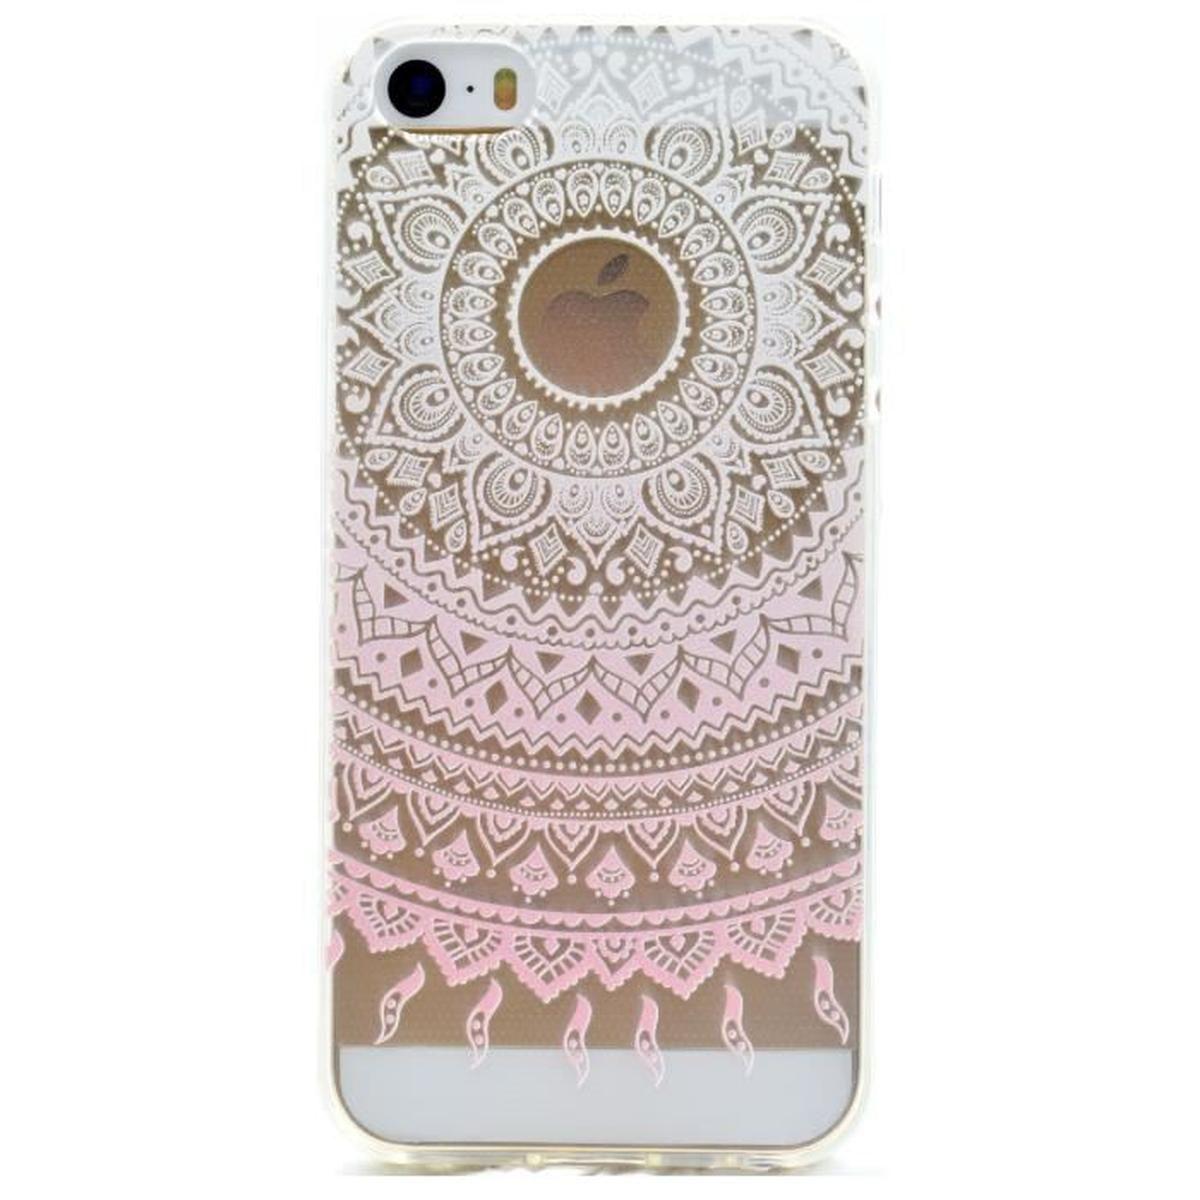 coque iphone 7 mandala menthe | Iphone 5s cases, Apple iphone 5s ...